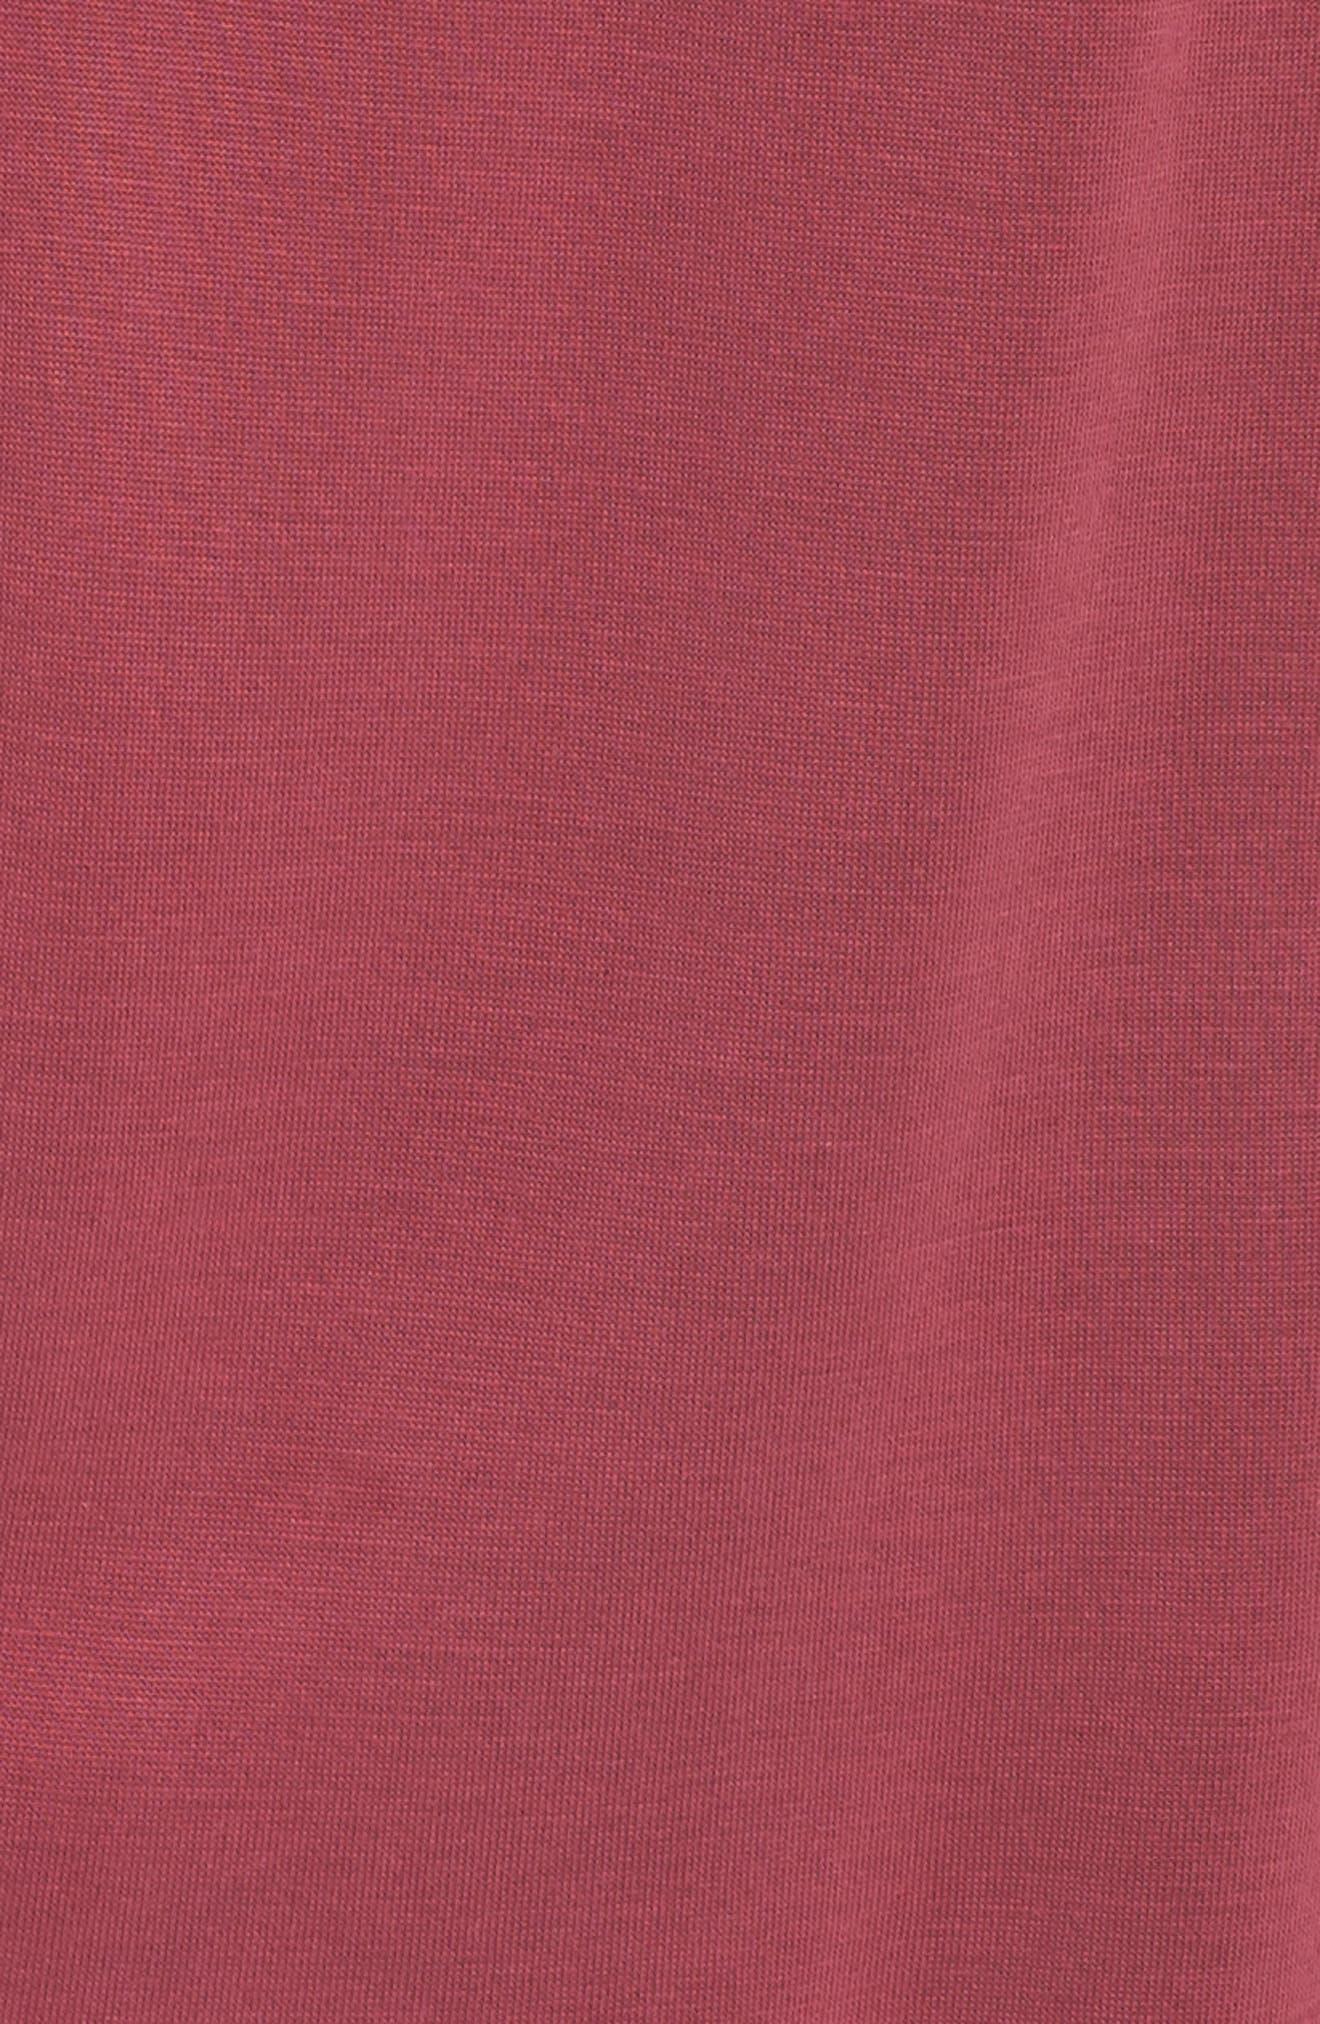 Sandwashed Chocker Neck Top,                             Alternate thumbnail 6, color,                             Beet Red